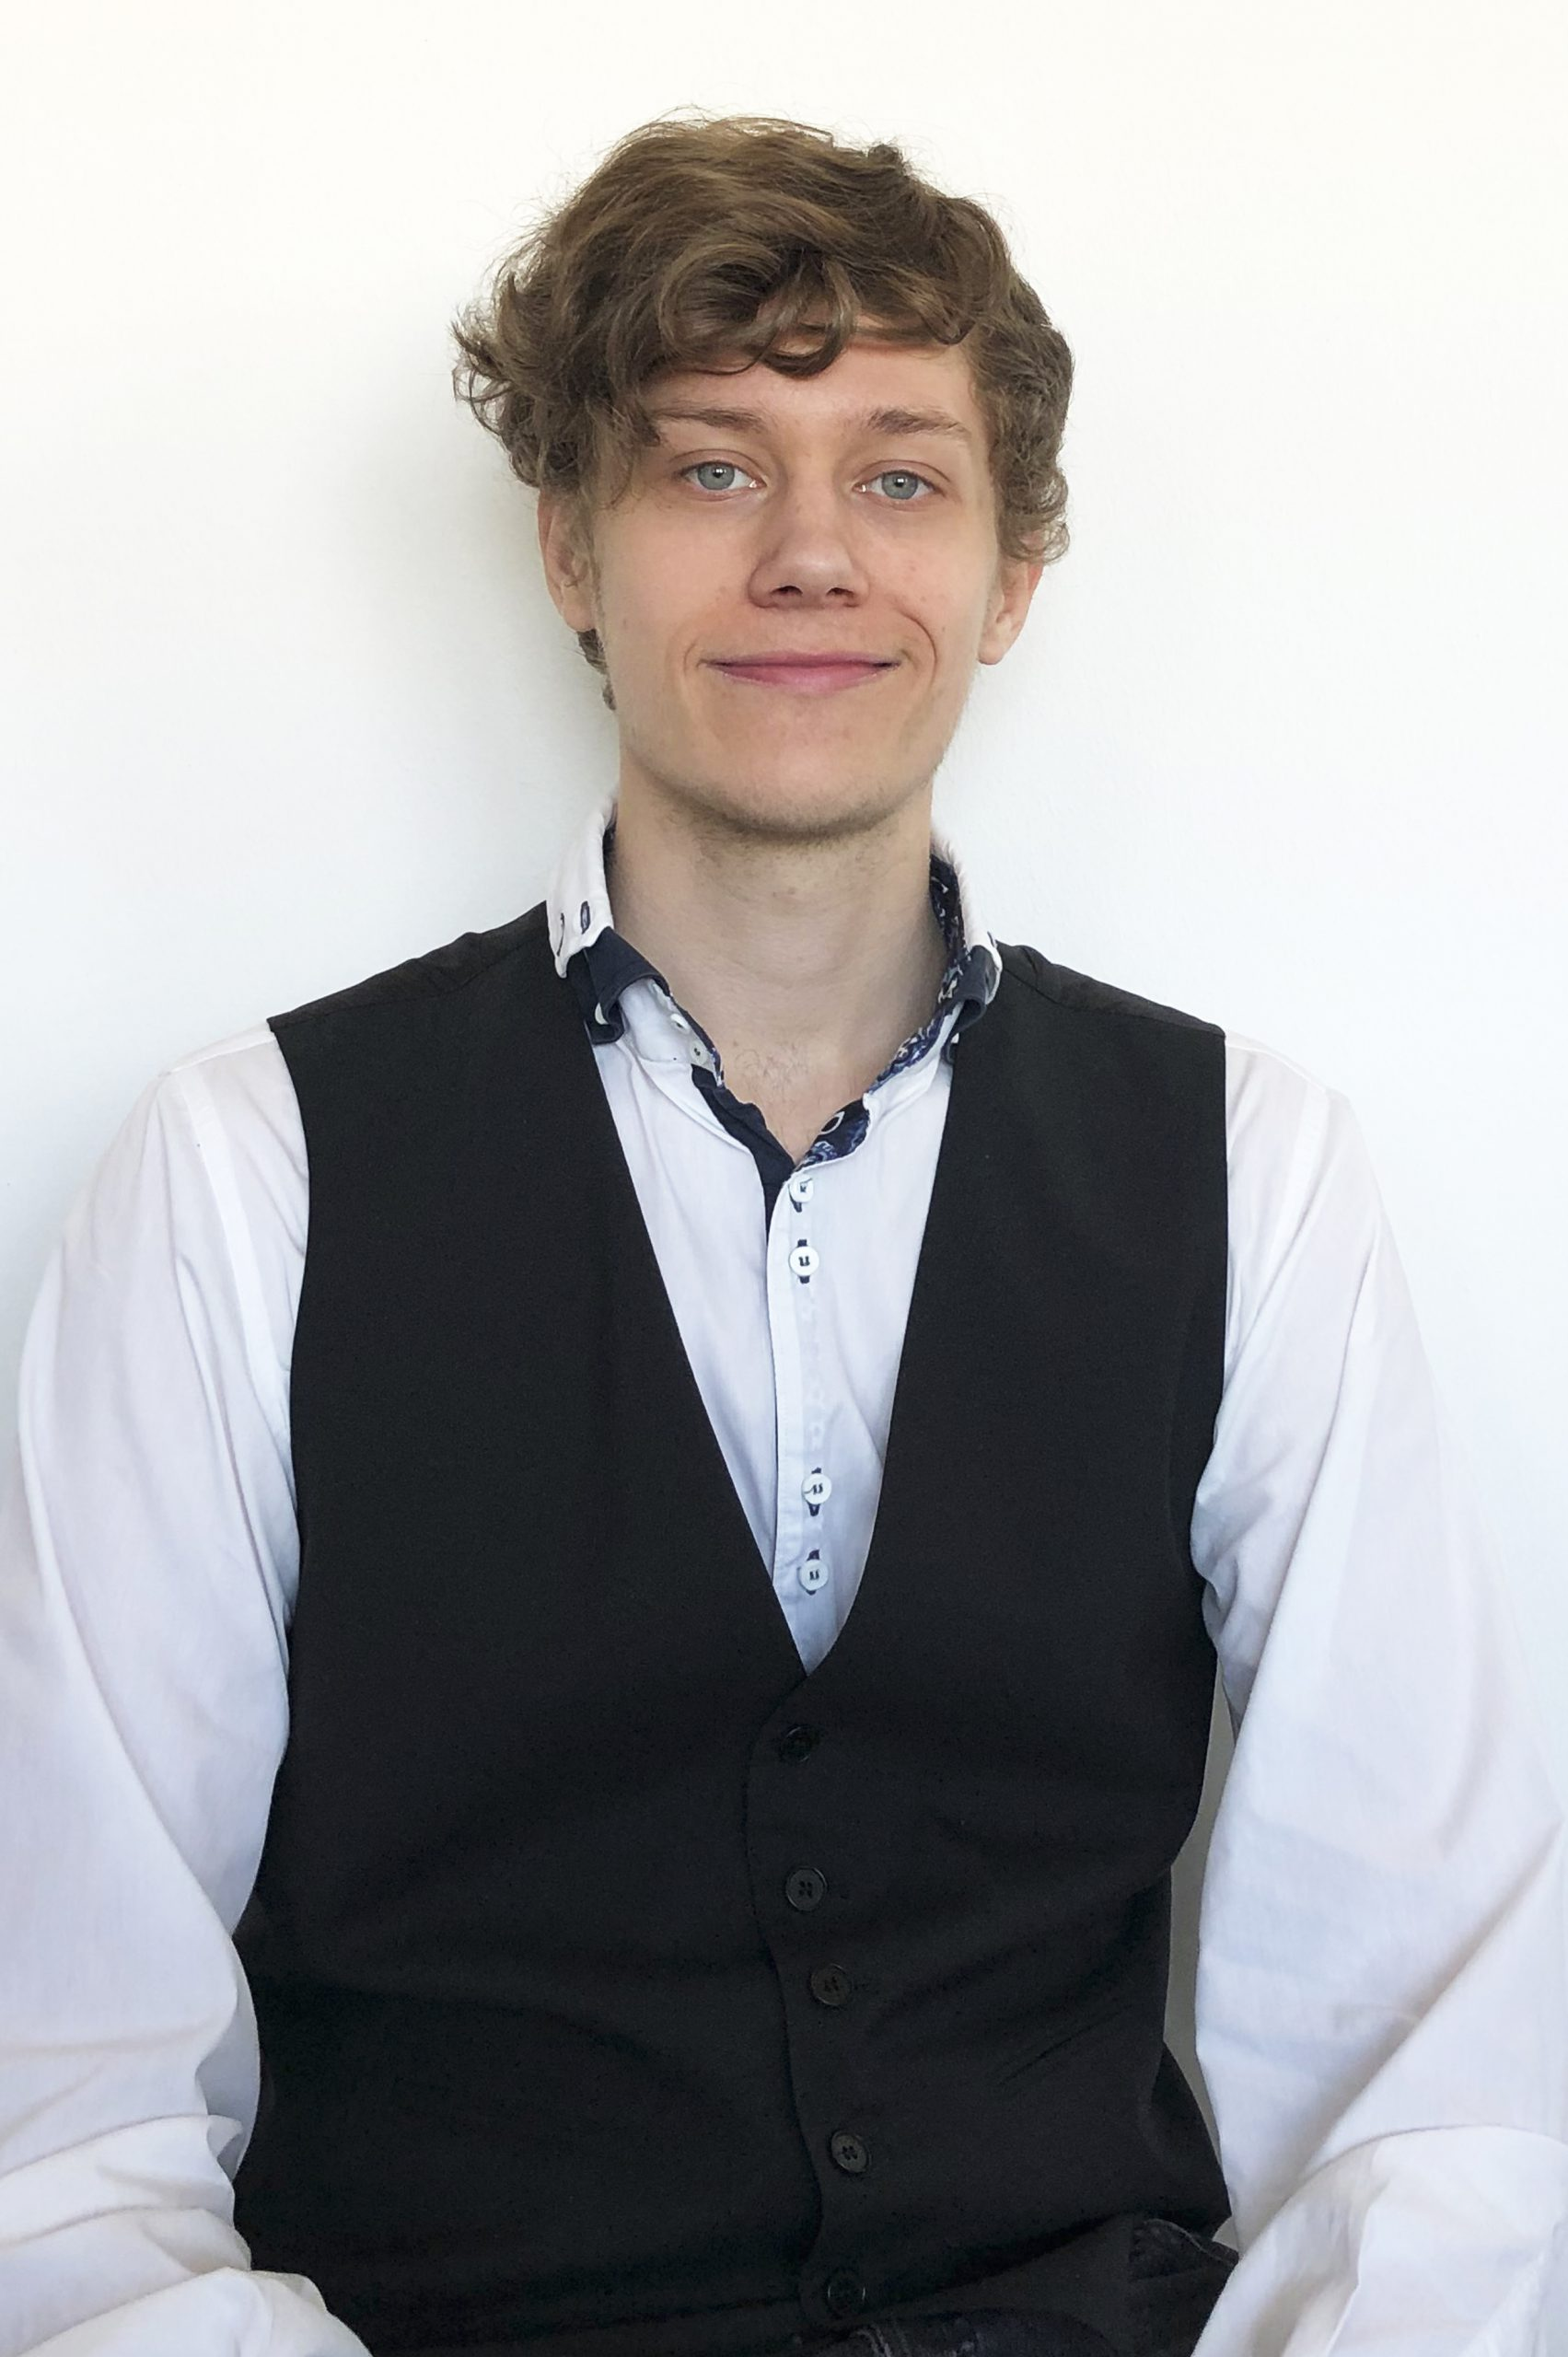 Tim Wittenberg